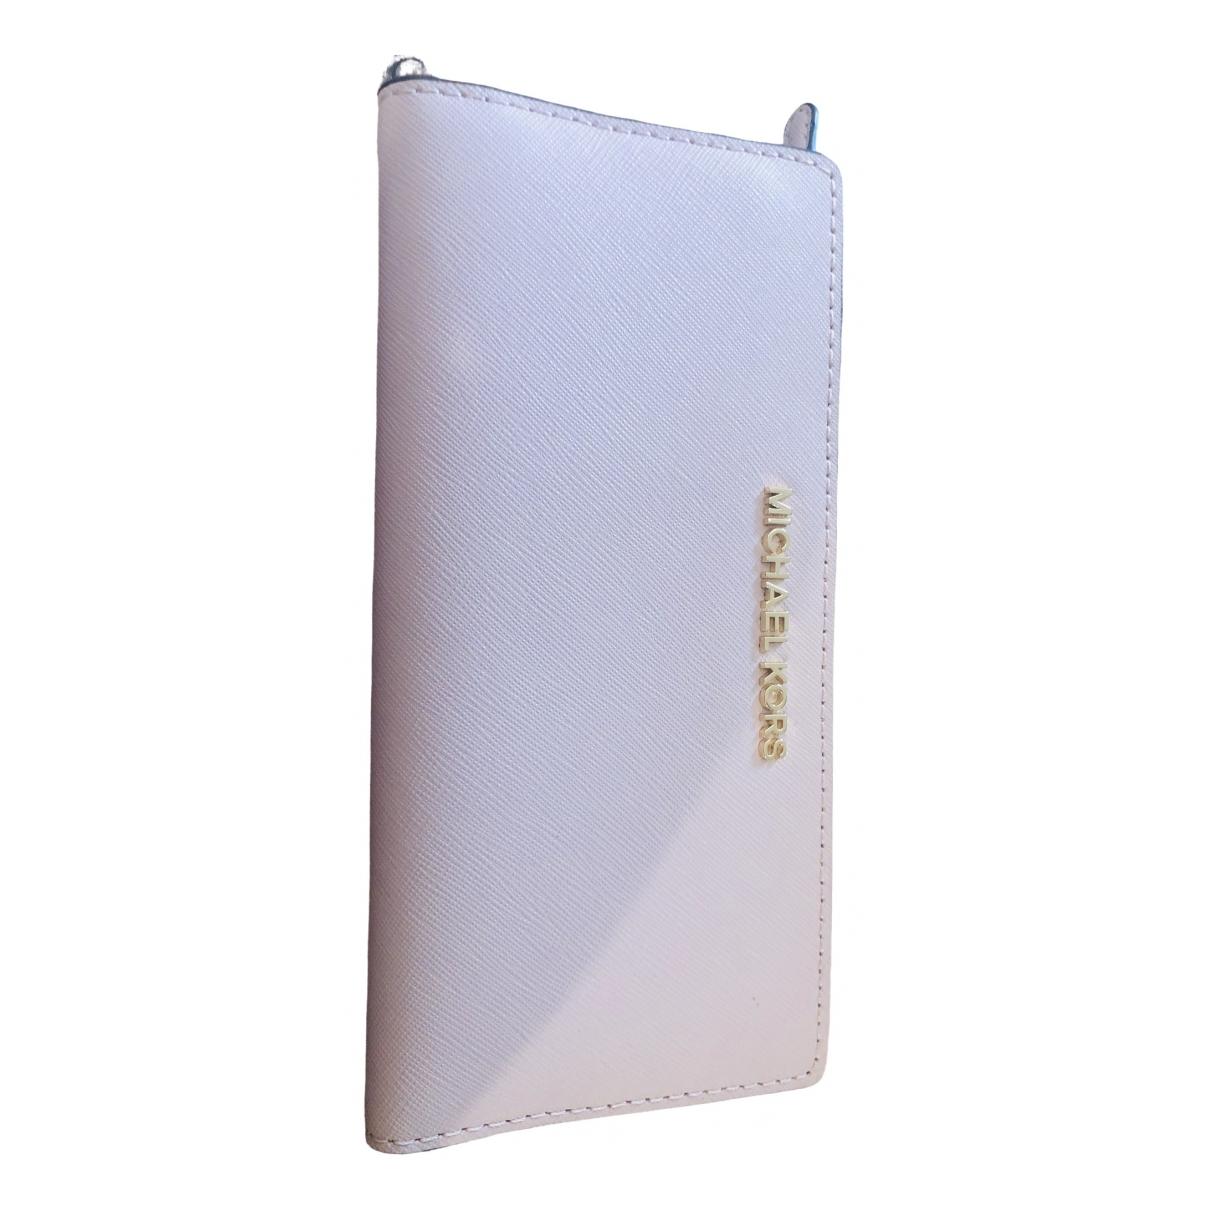 Michael Kors \N Pink Leather wallet for Women \N